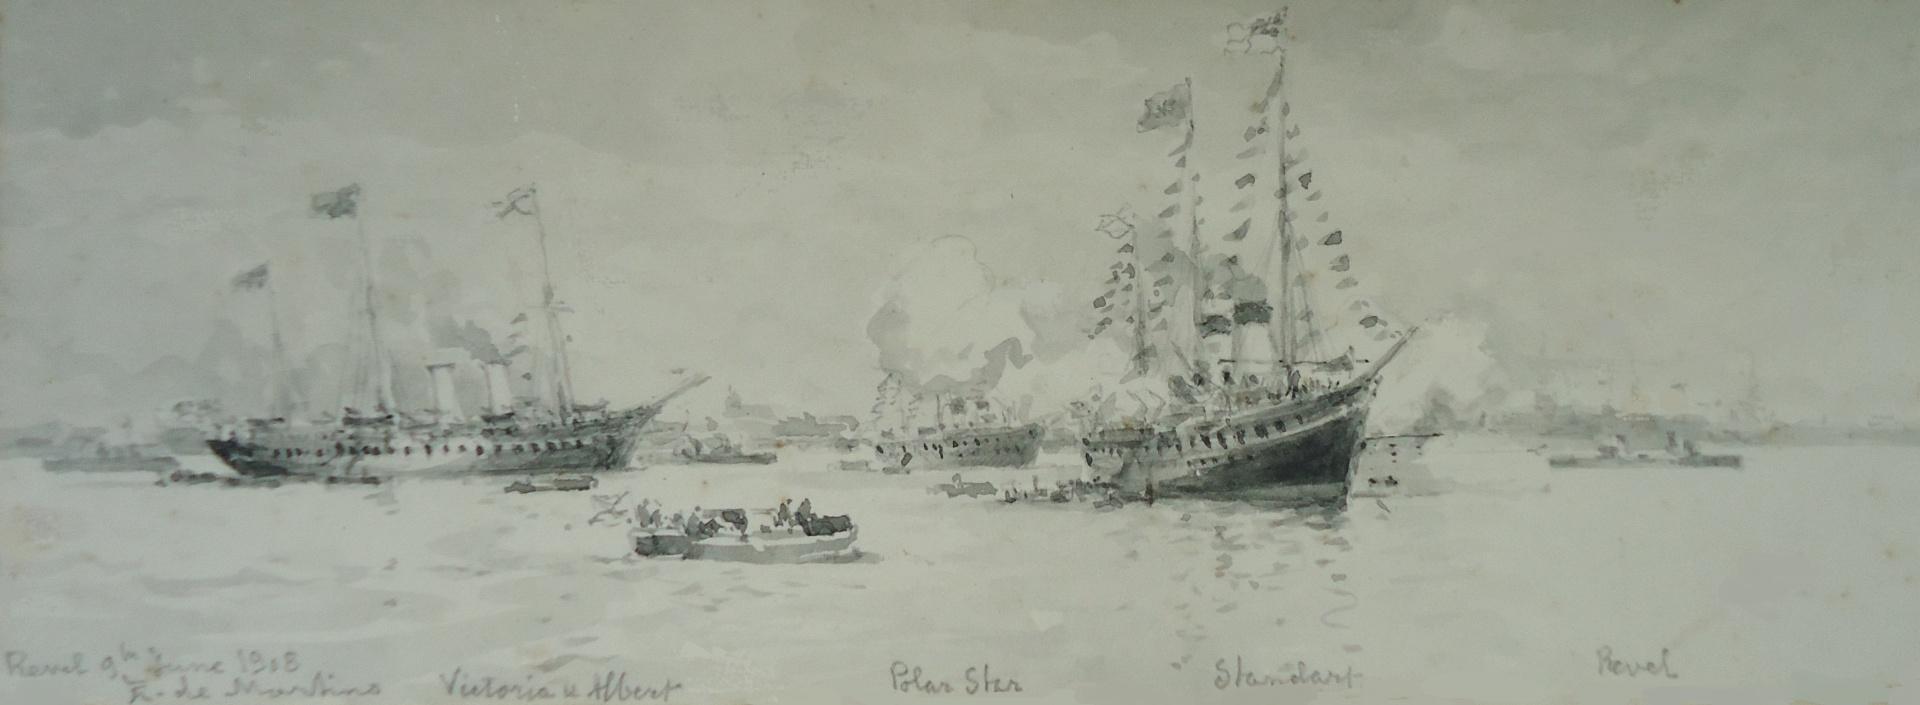 Royal Yacht VICTORIA & ALBERT visits Russia, June 1908